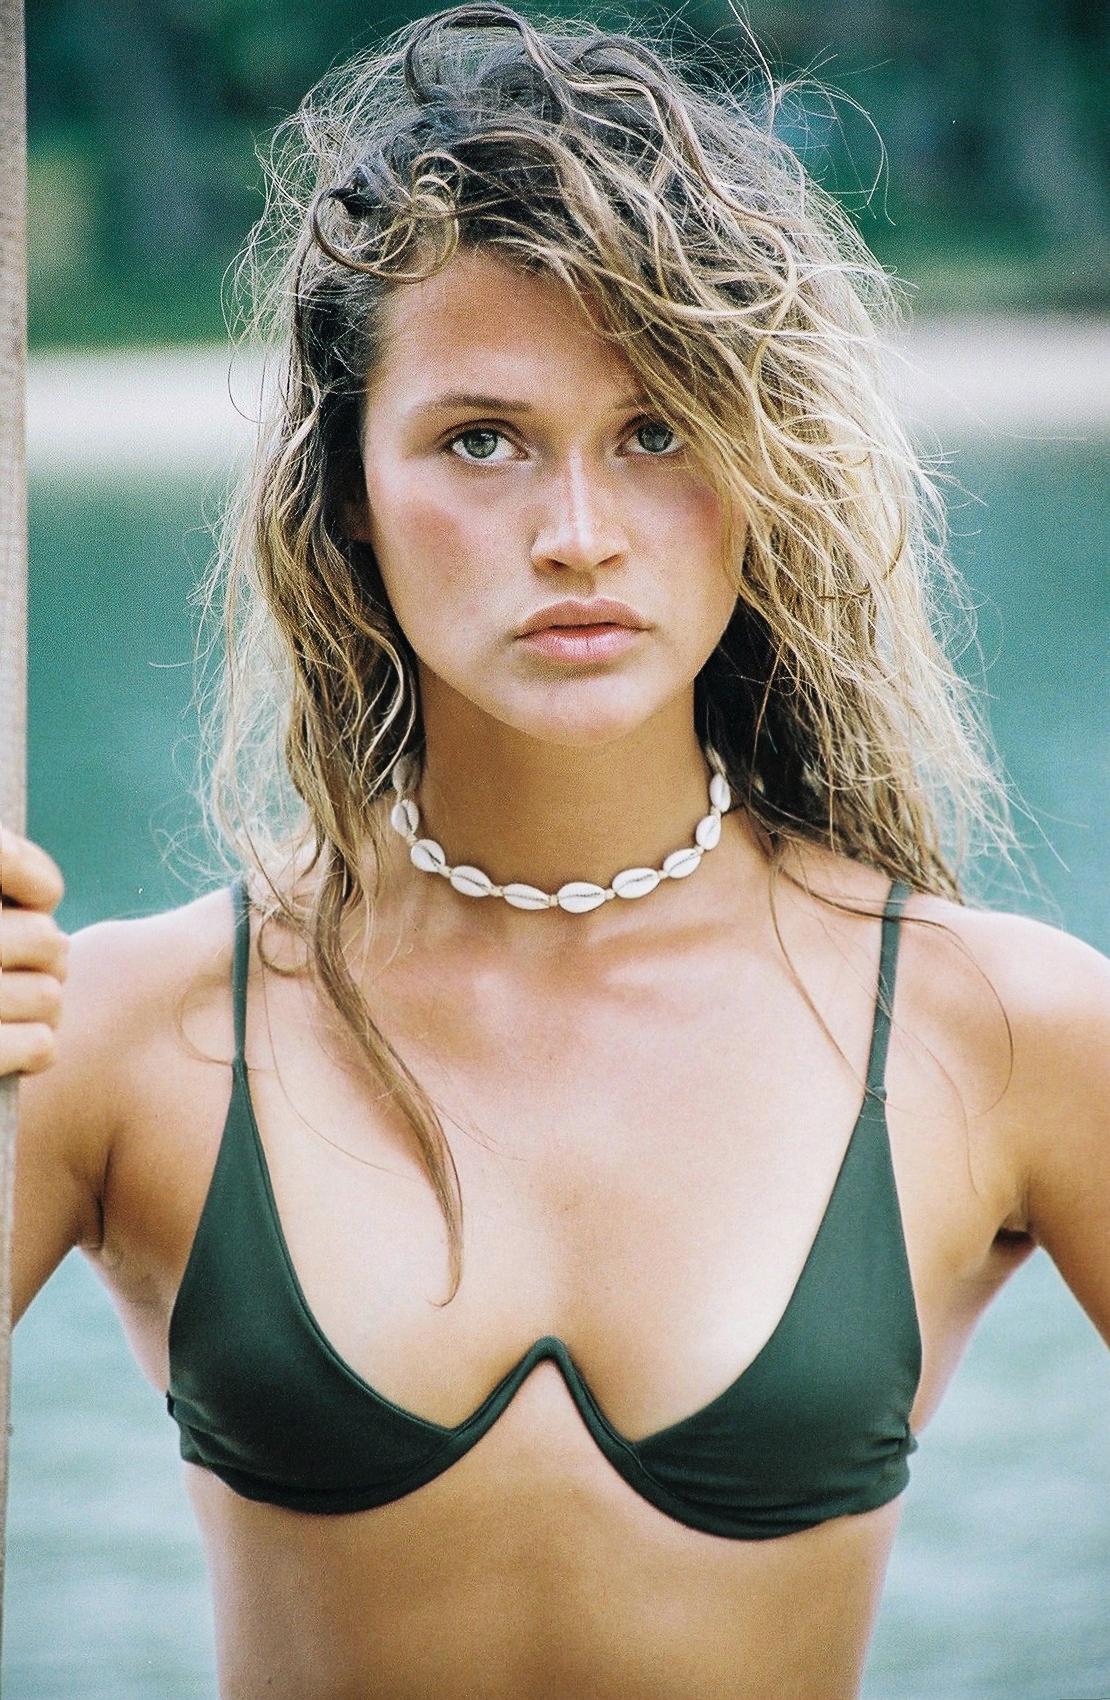 Swimsuit Tanya Girardi nude (91 photos) Young, 2017, lingerie